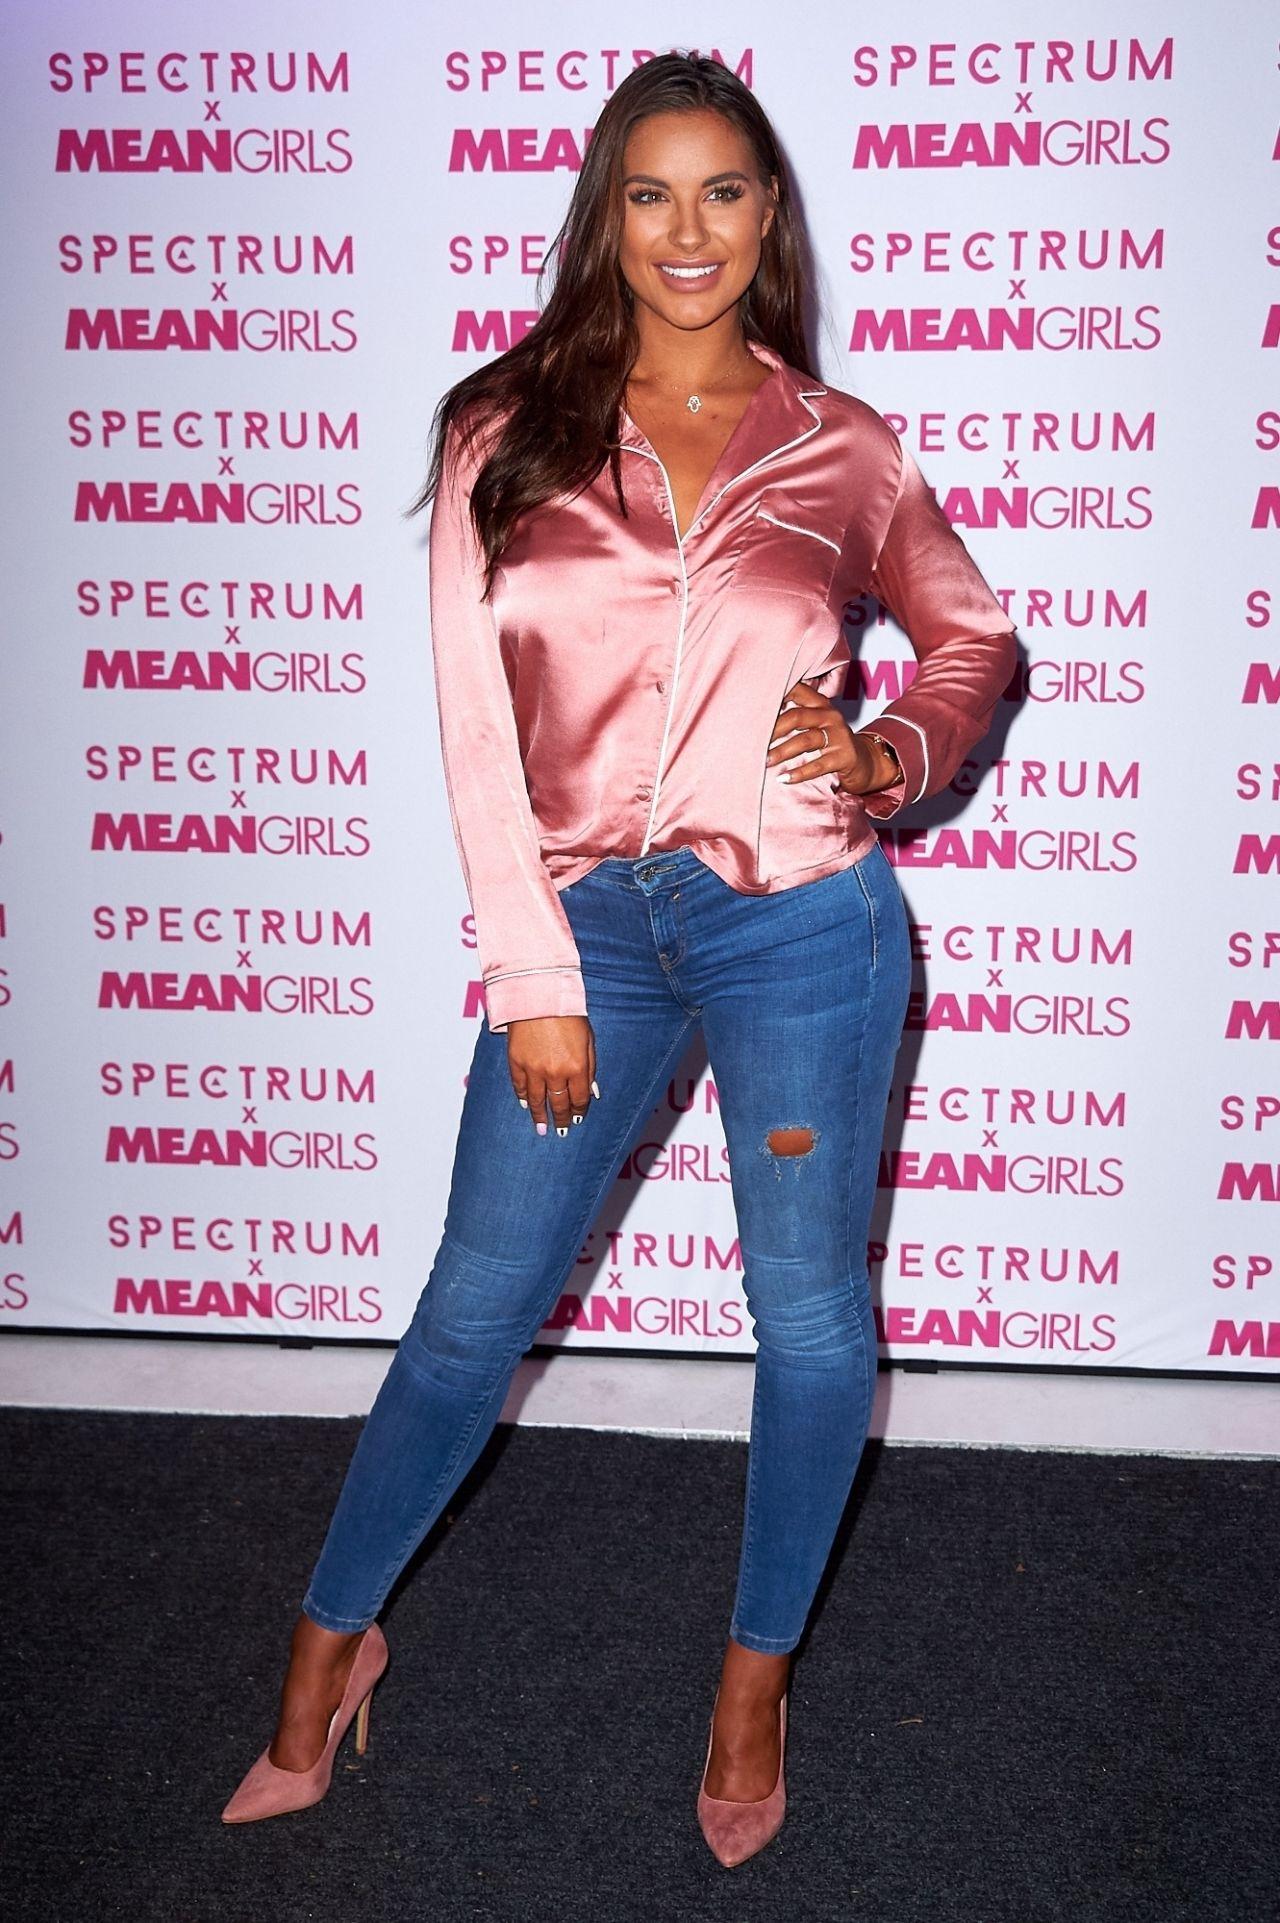 Jessica Shears Spectrum And Mean Girls Burn Book Launch